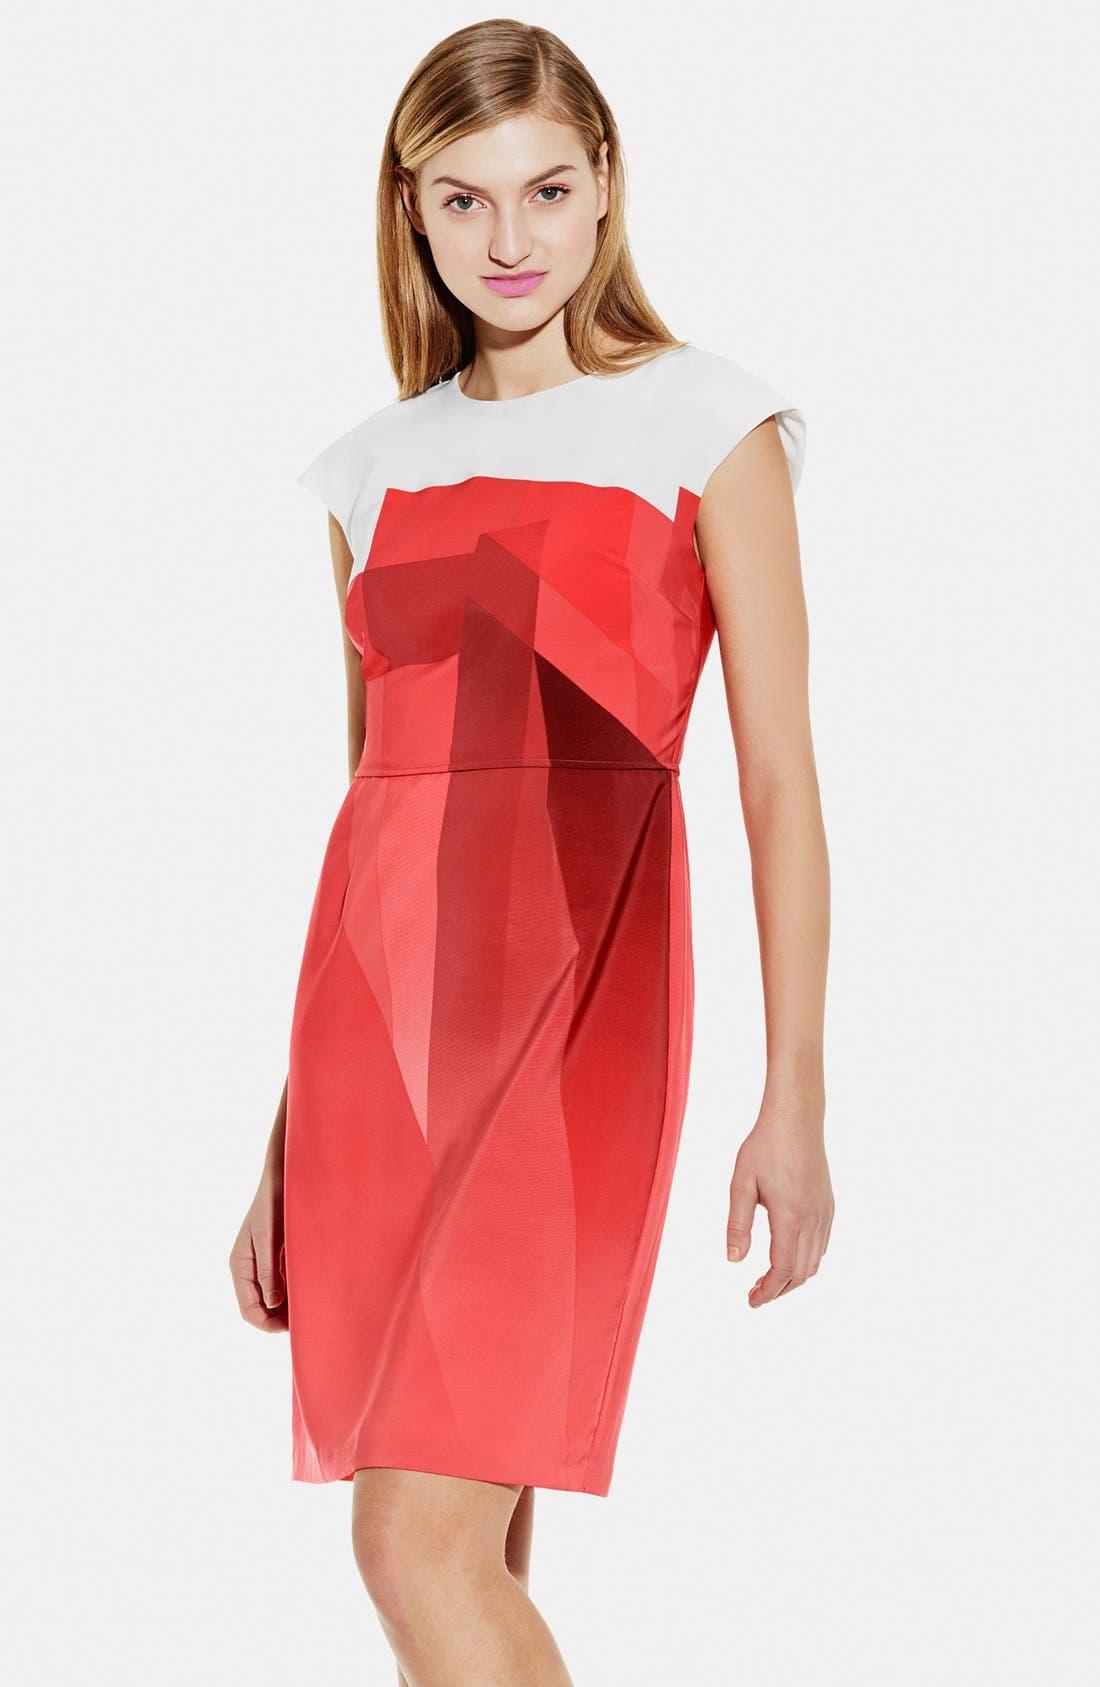 Alternate Image 1 Selected - Vince Camuto Contrast Yoke Ombré Print Sheath Dress (Regular & Petite)